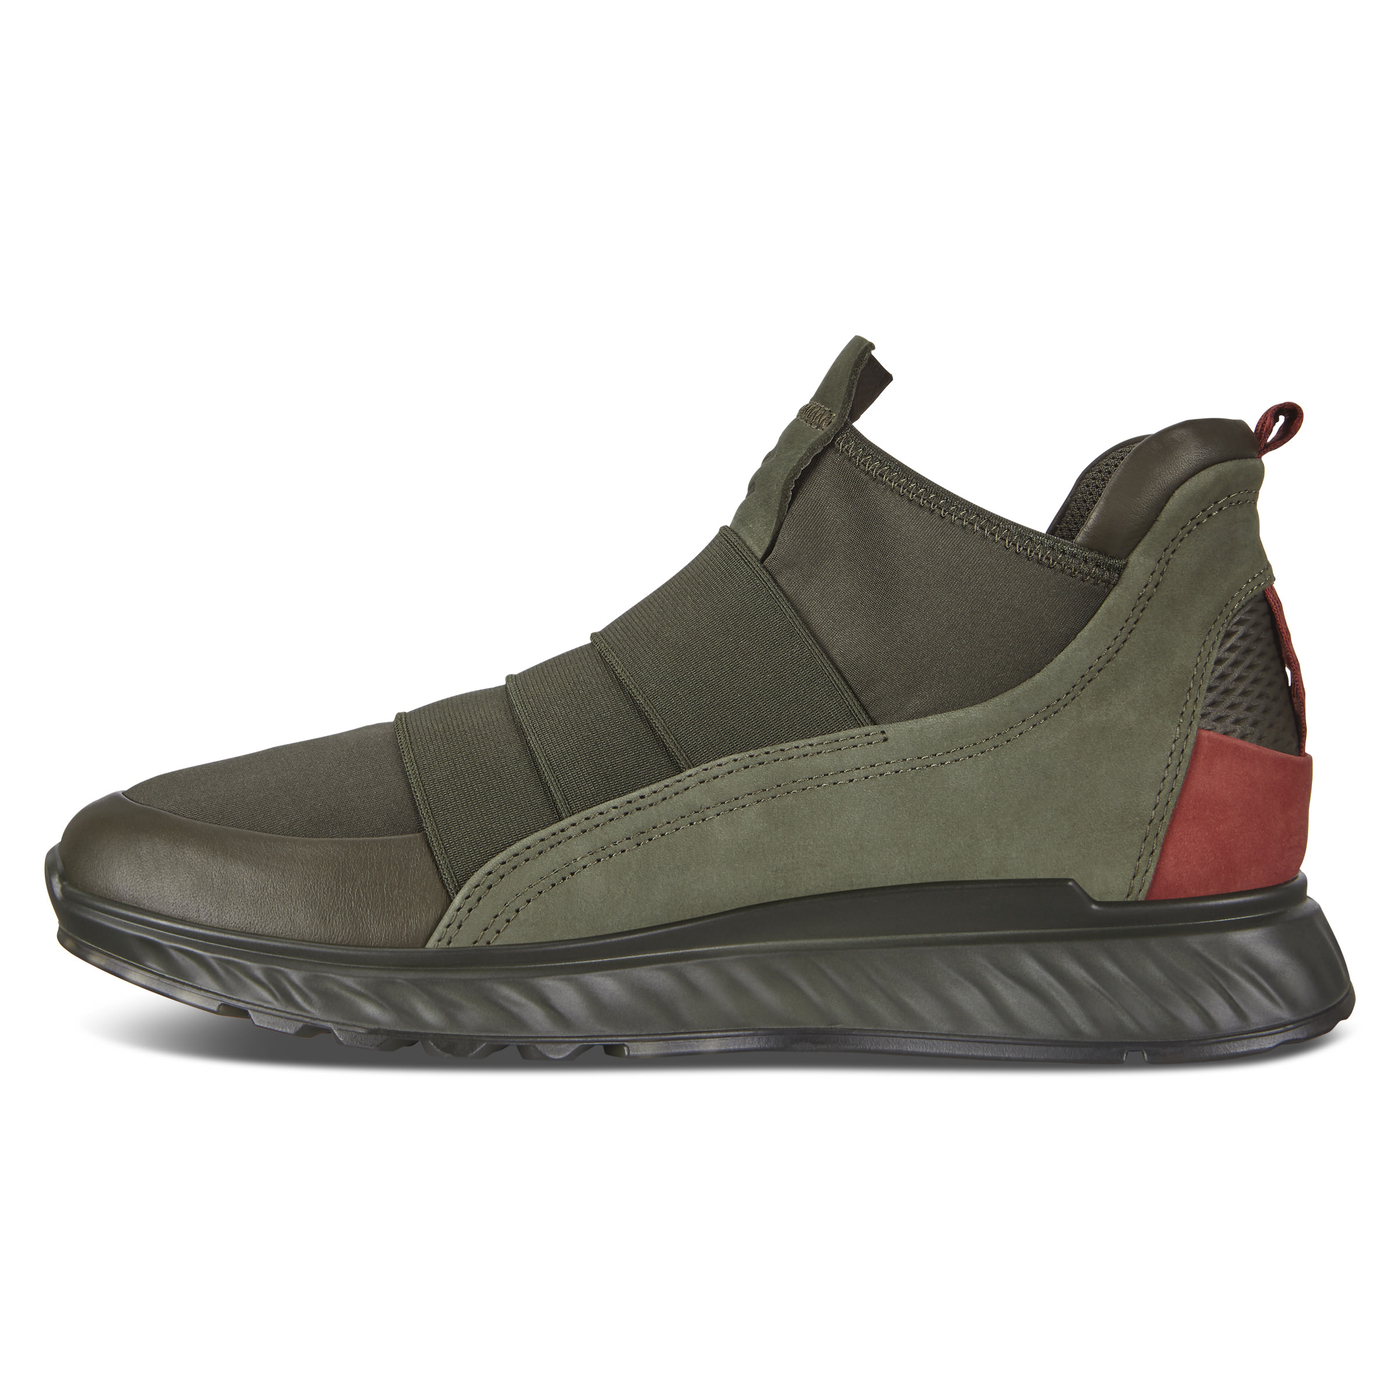 165a5c078a ECCO ST.1 Band Men's Sneaker